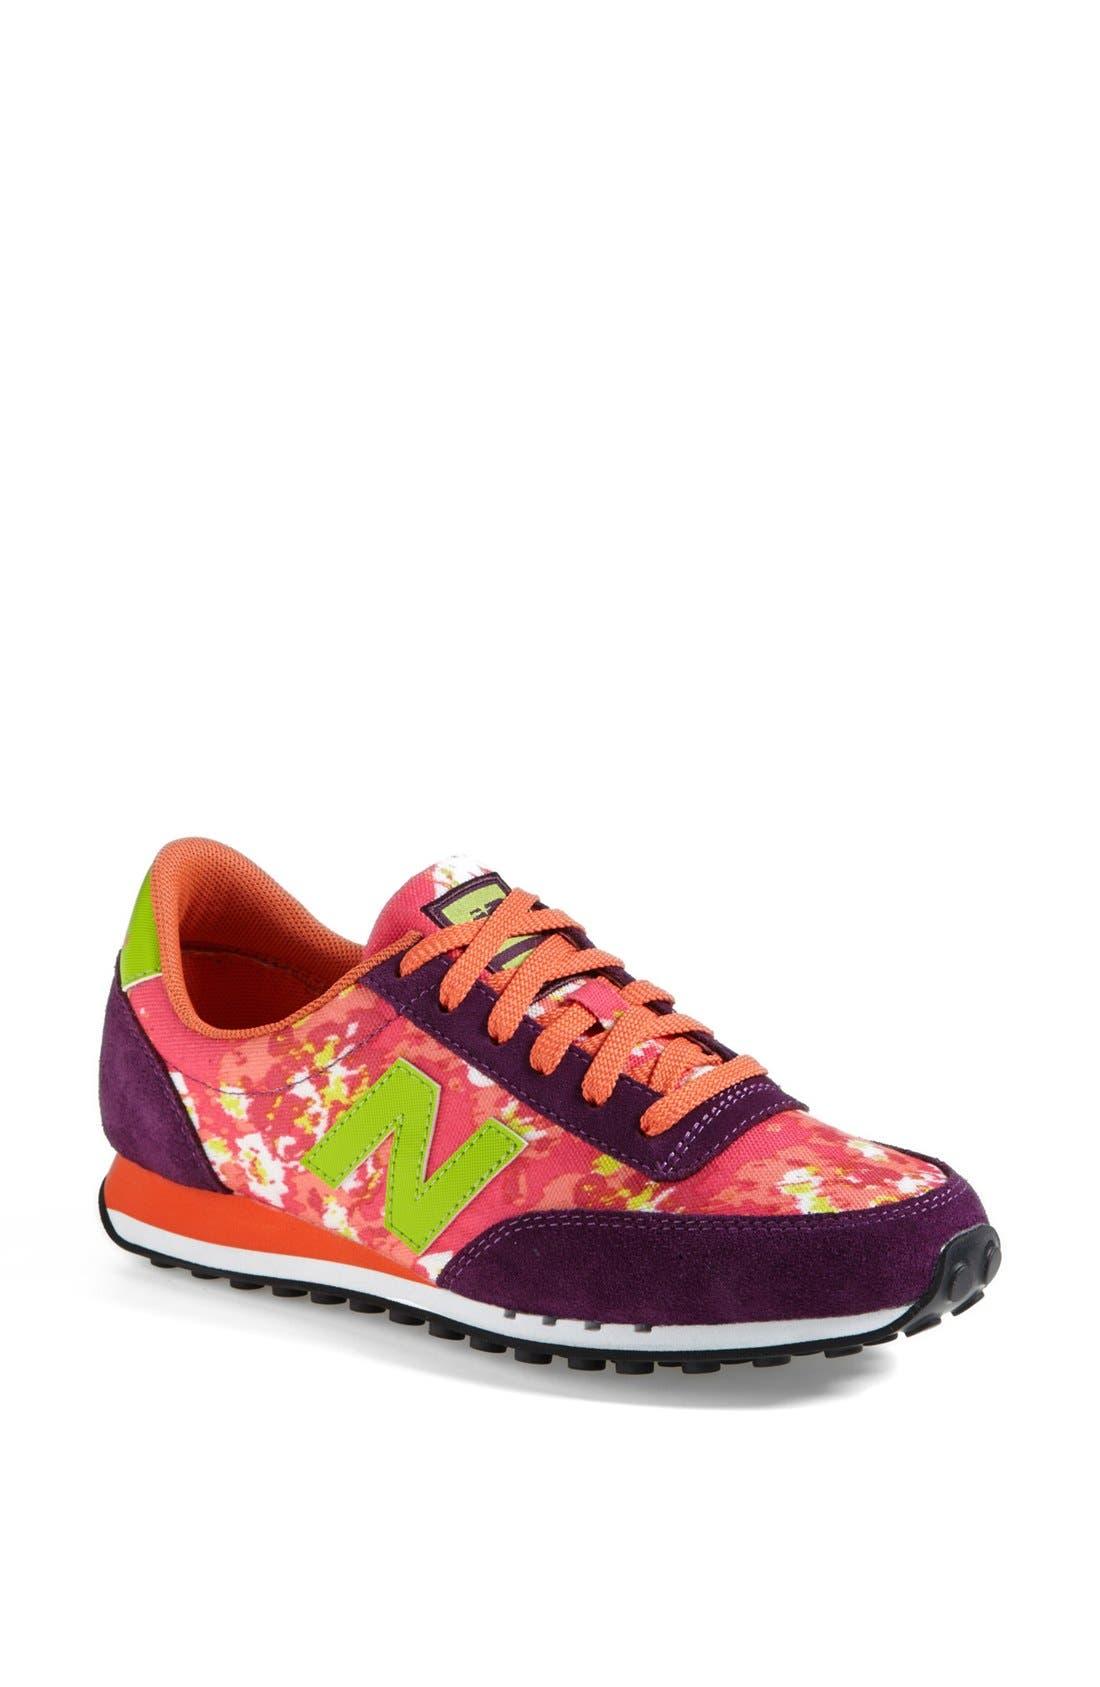 Alternate Image 1 Selected - New Balance '410 Floral Blur' Sneaker (Women)